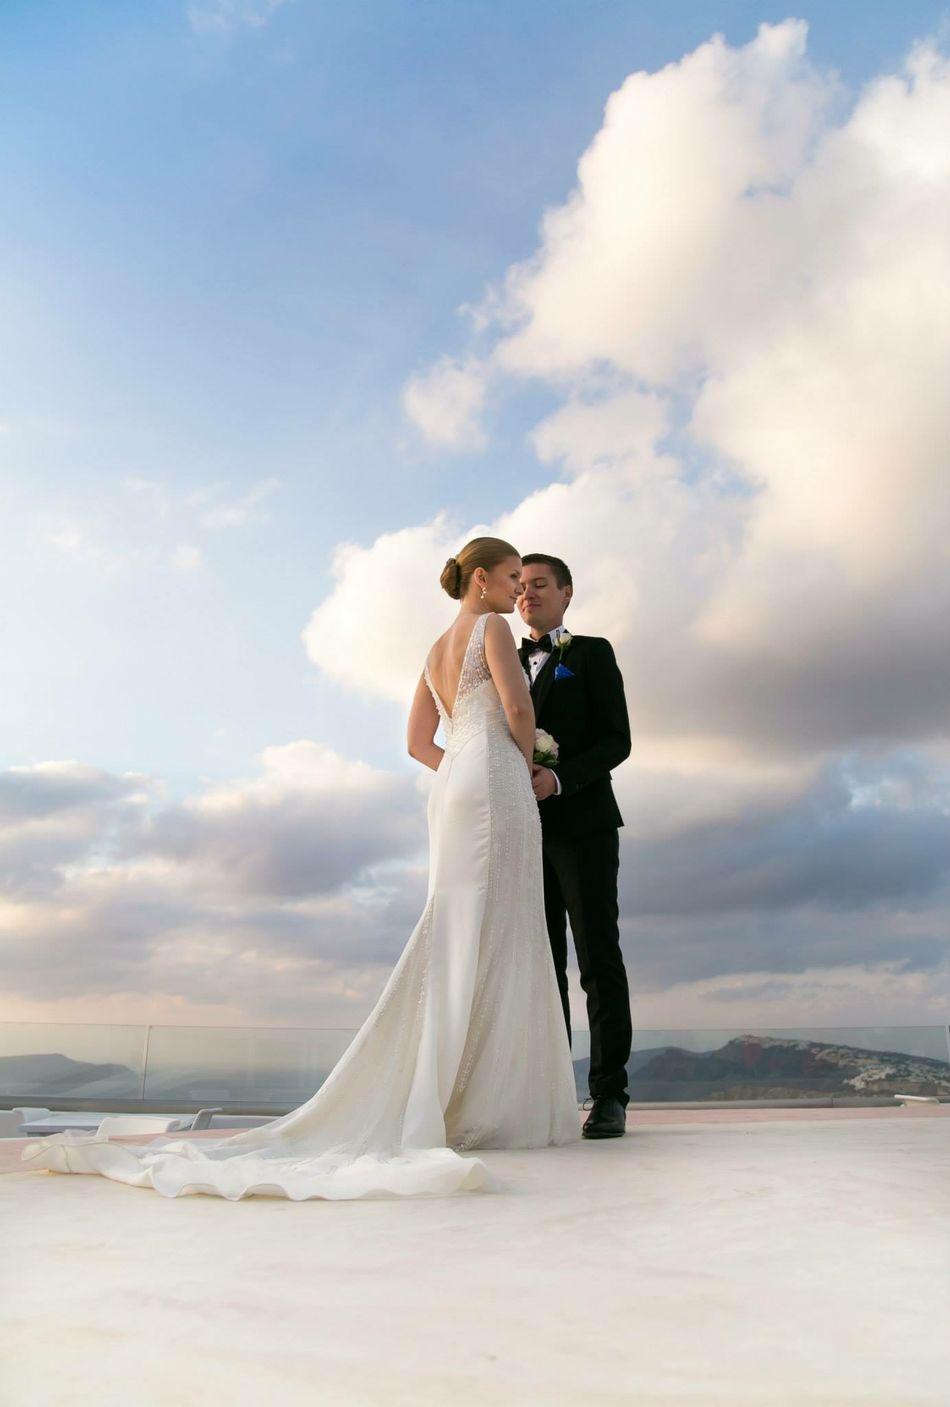 Beautiful stock photos of hochzeit, 25-29 Years, Bonding, Bride, Bridegroom